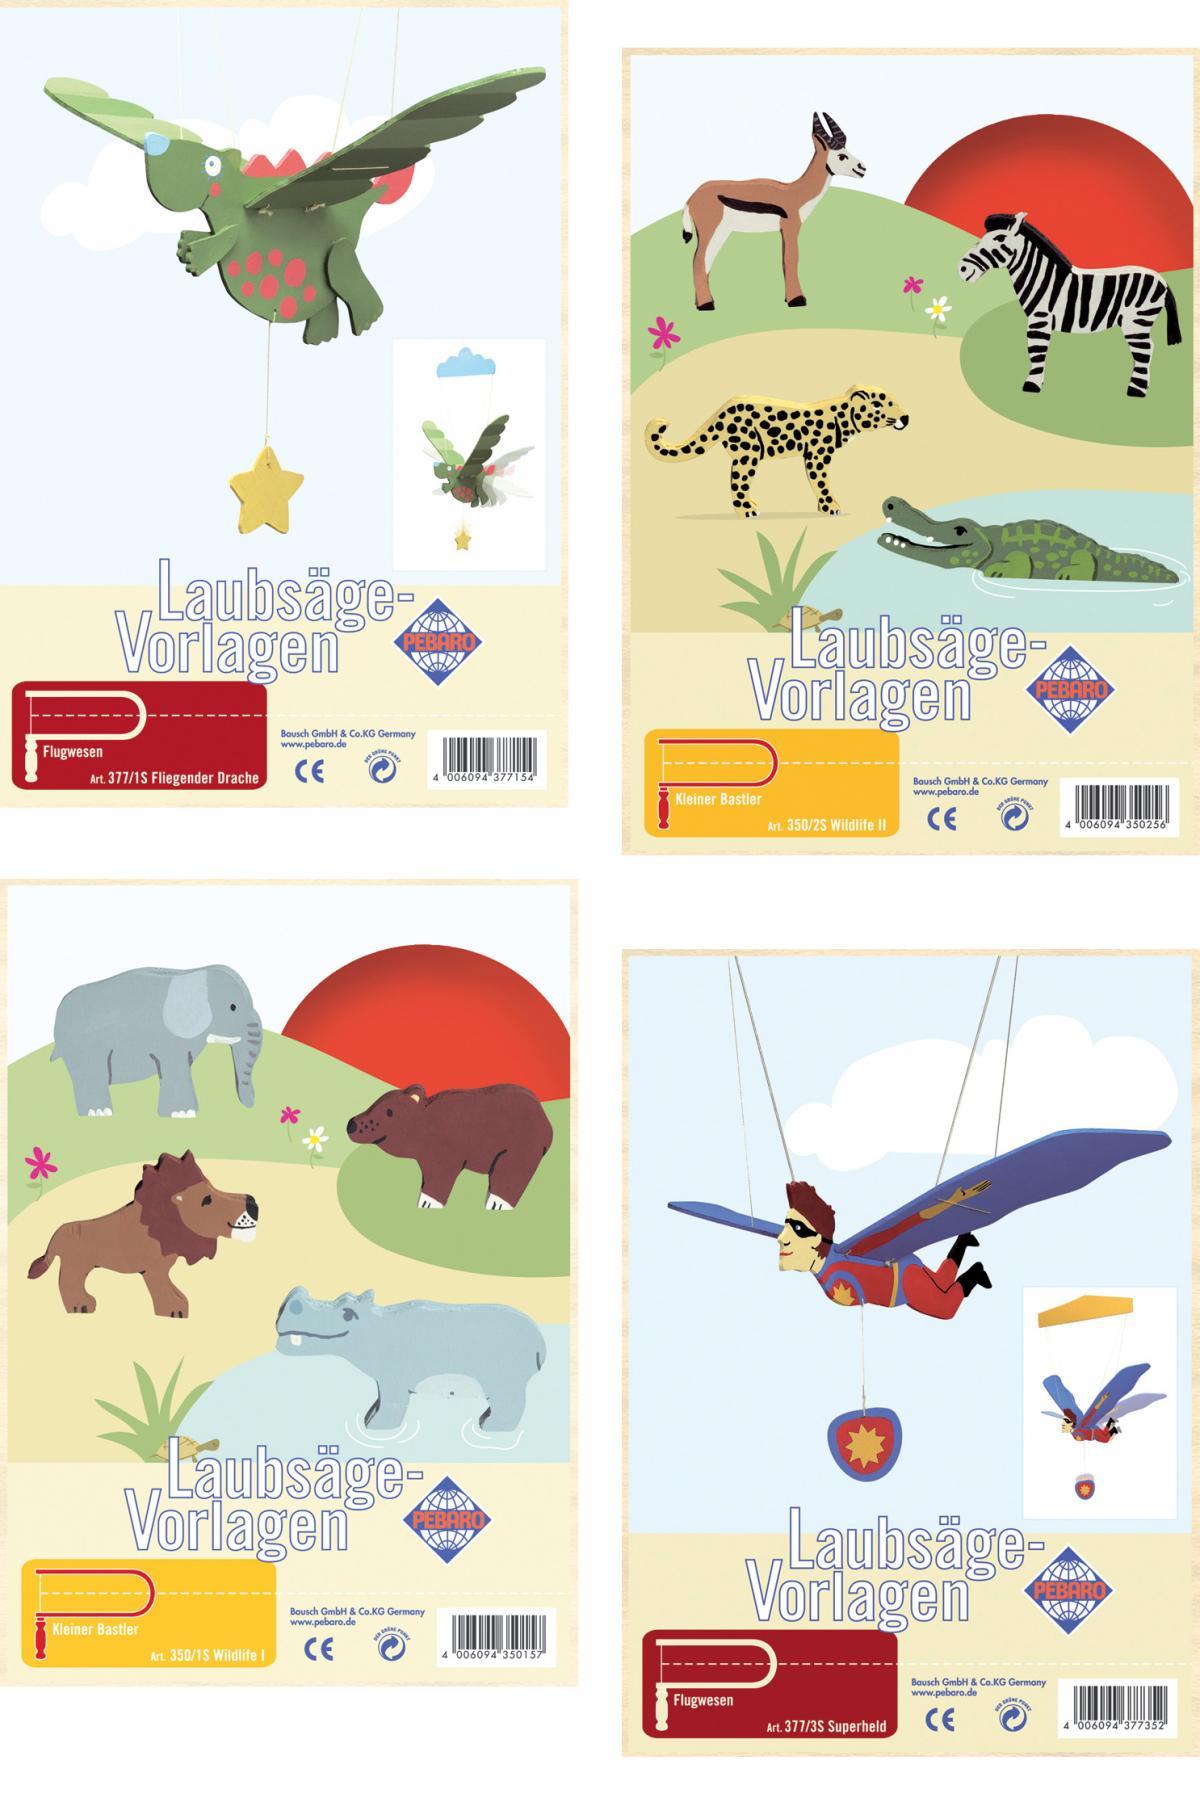 PEBARO Laubsägevorlage Mobilé Tiere